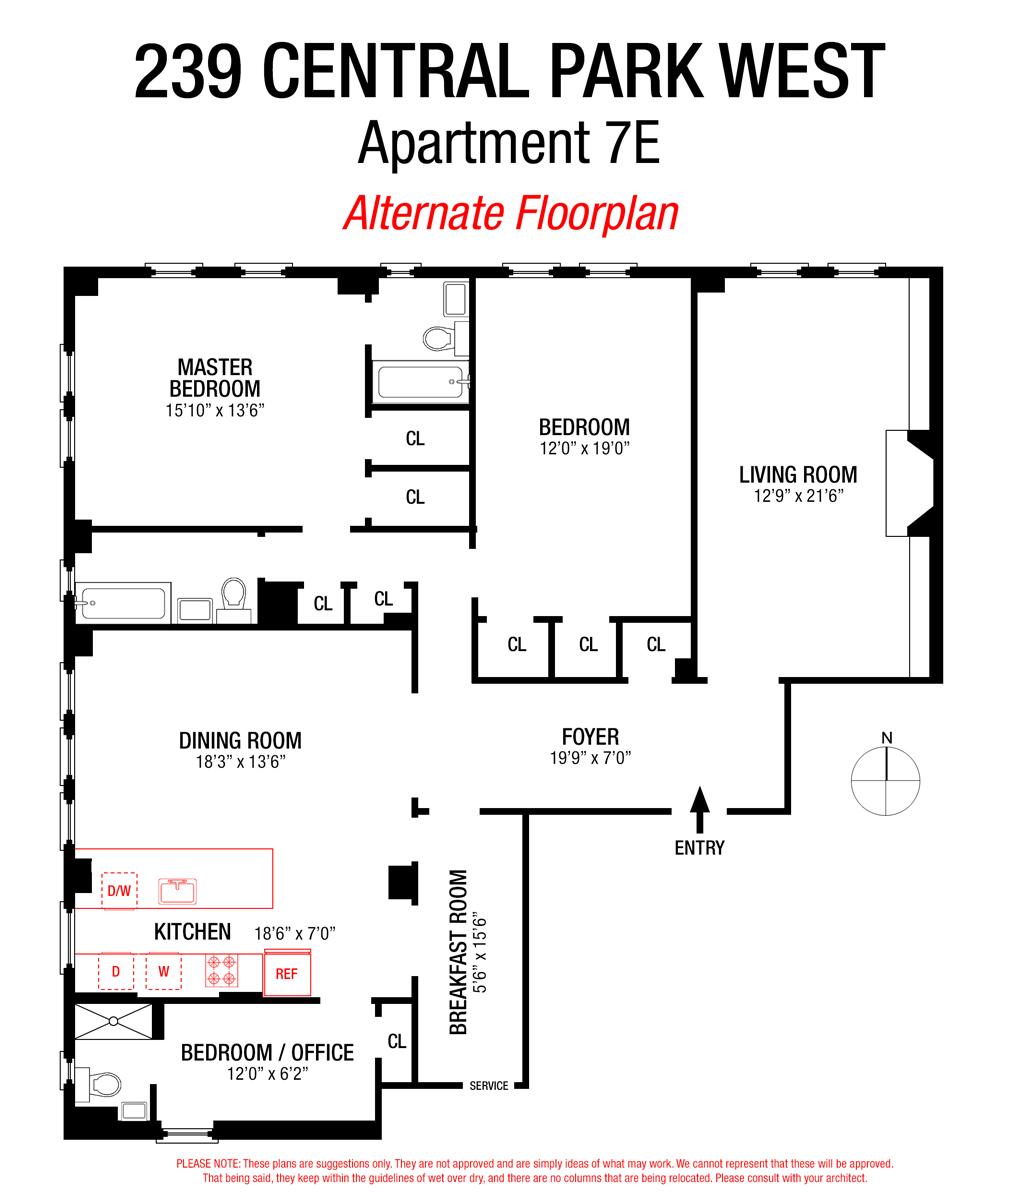 Central Park West Real Estate: StreetEasy: 239 Central Park West In Upper West Side, #7E - Sales, Rentals, Floorplans